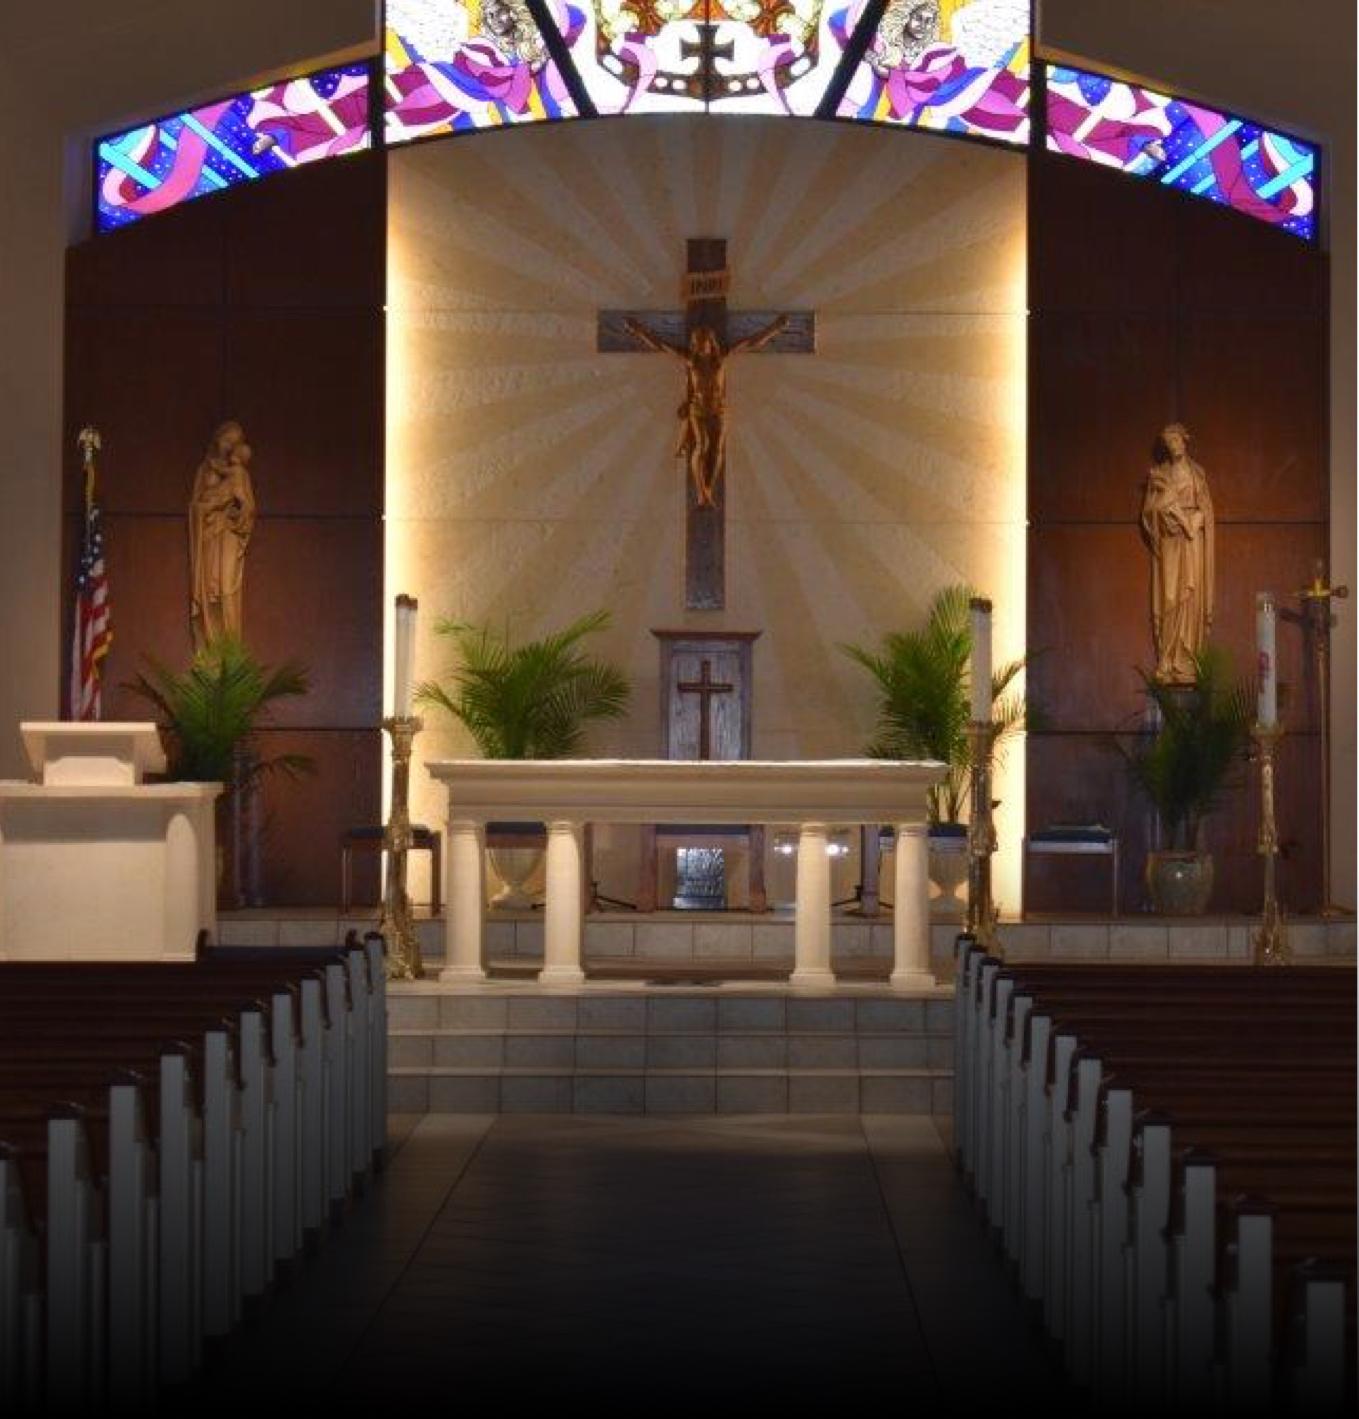 Interior view of new church build altar at St. Stephen's Catholic Church, Midlands, TX